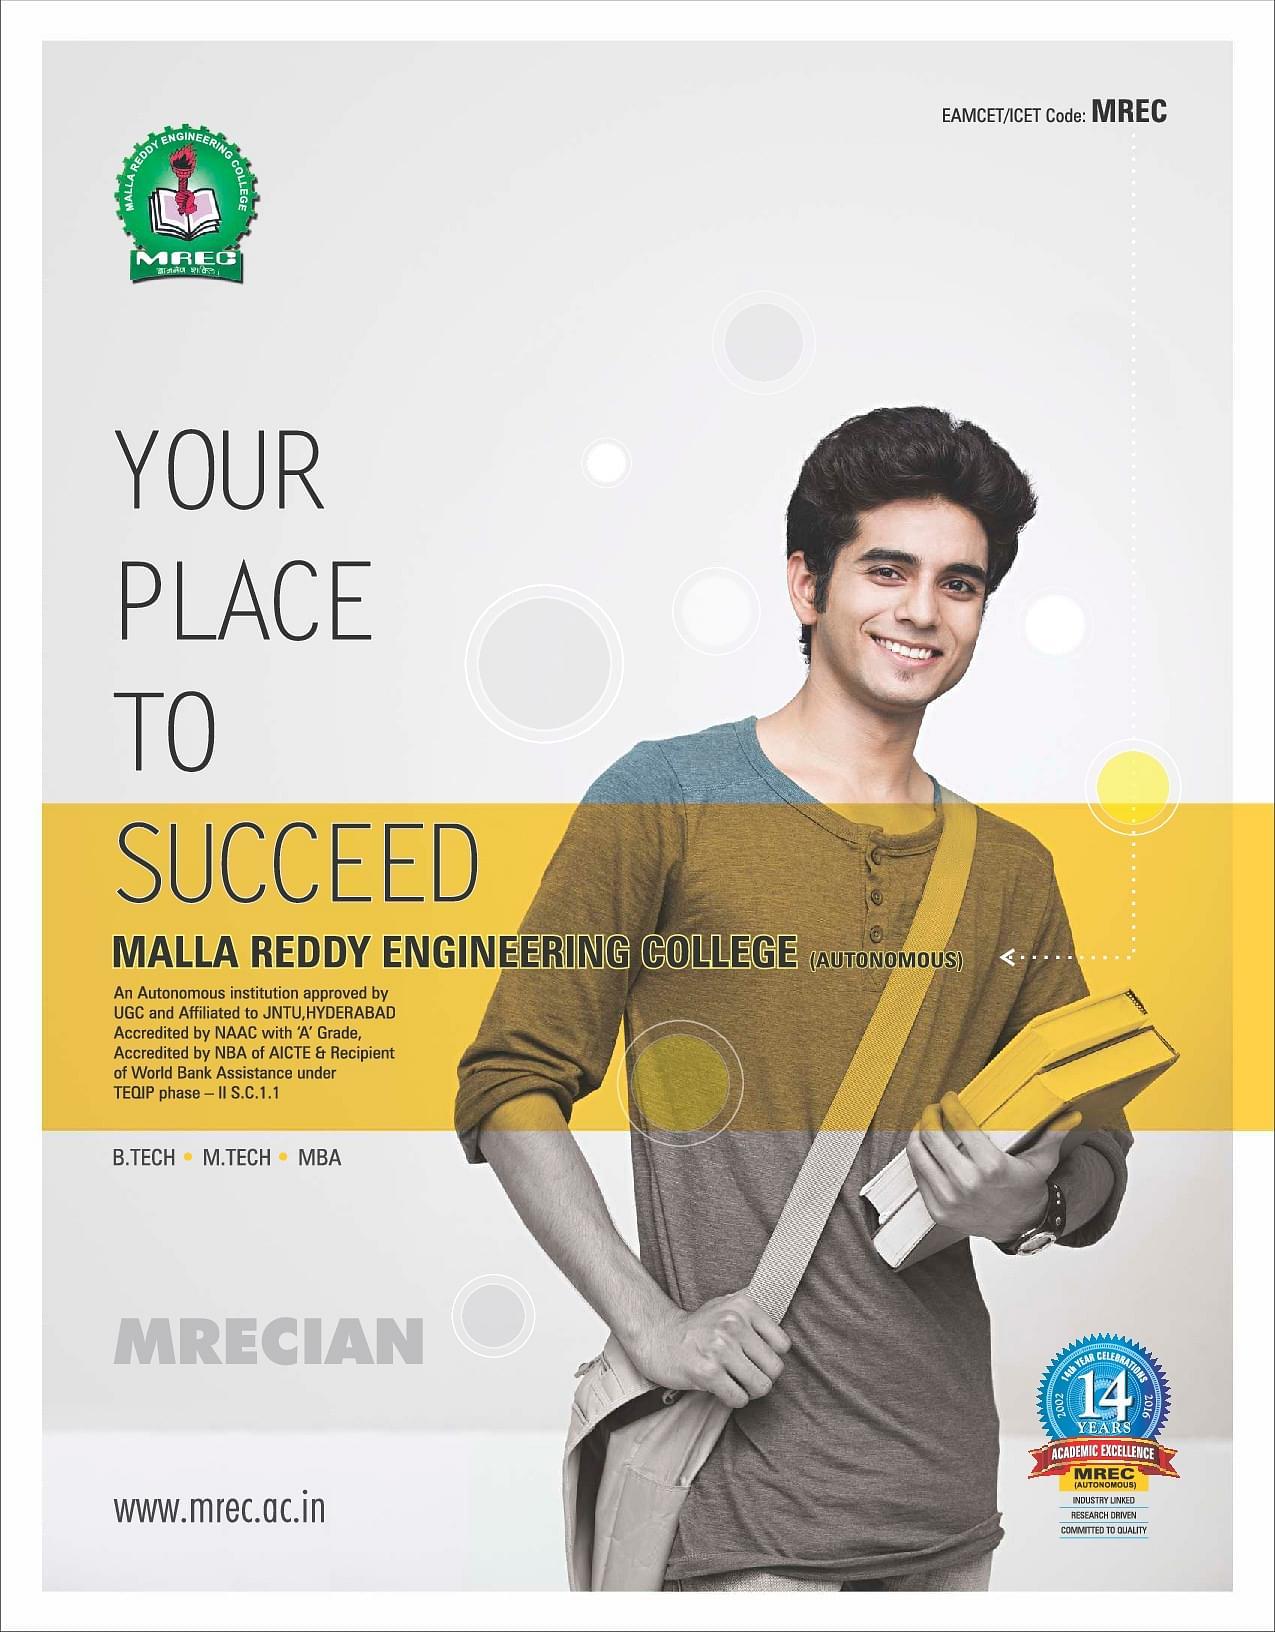 Malla Reddy Engineering College MREC Hyderabad Admissions – College Brochure